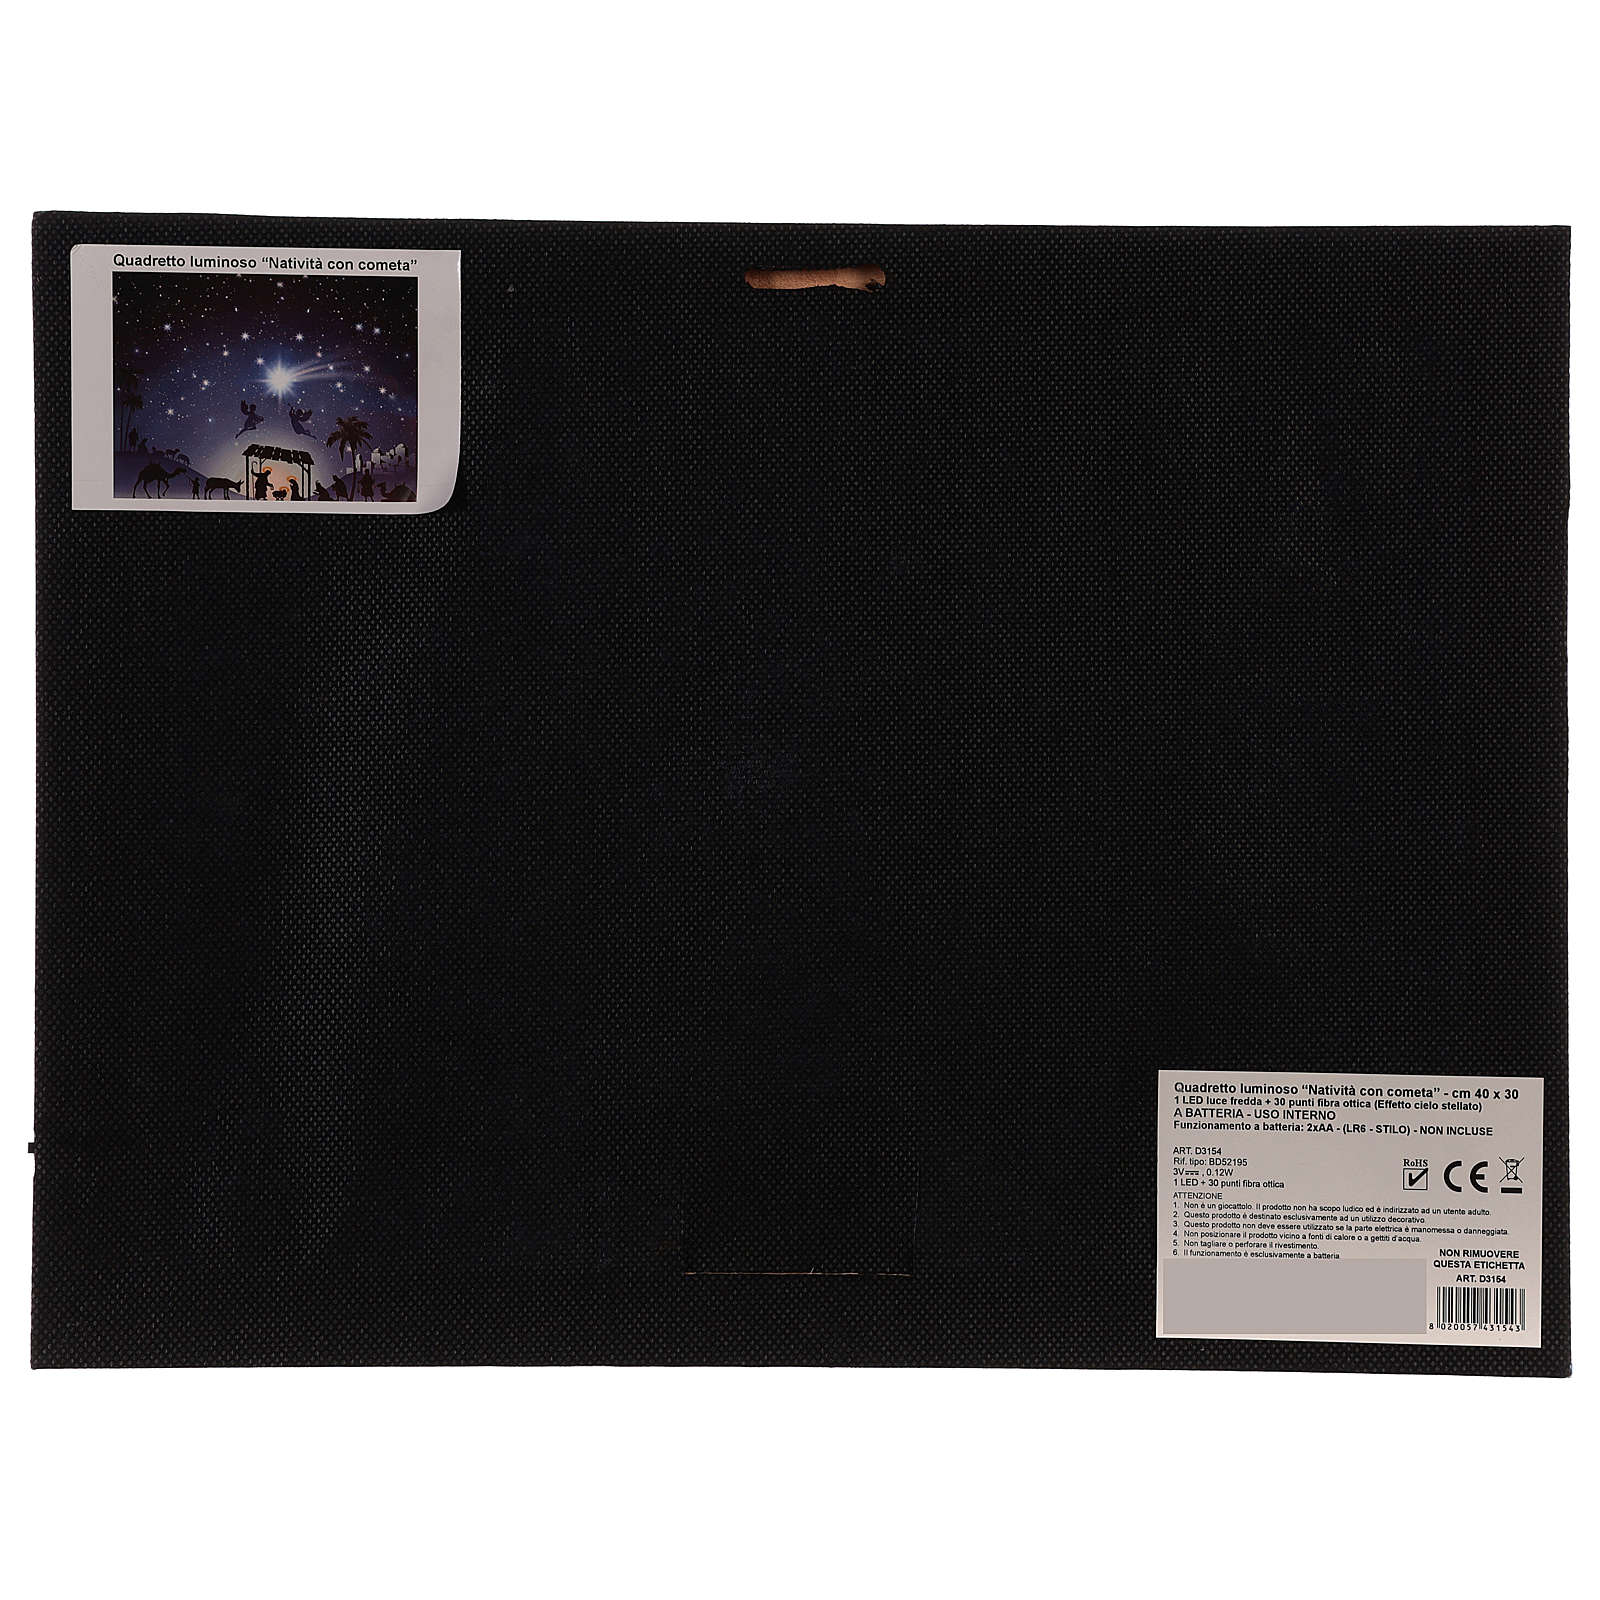 Cuadro iluminado led Natividad y cometa 30x40 cm 3